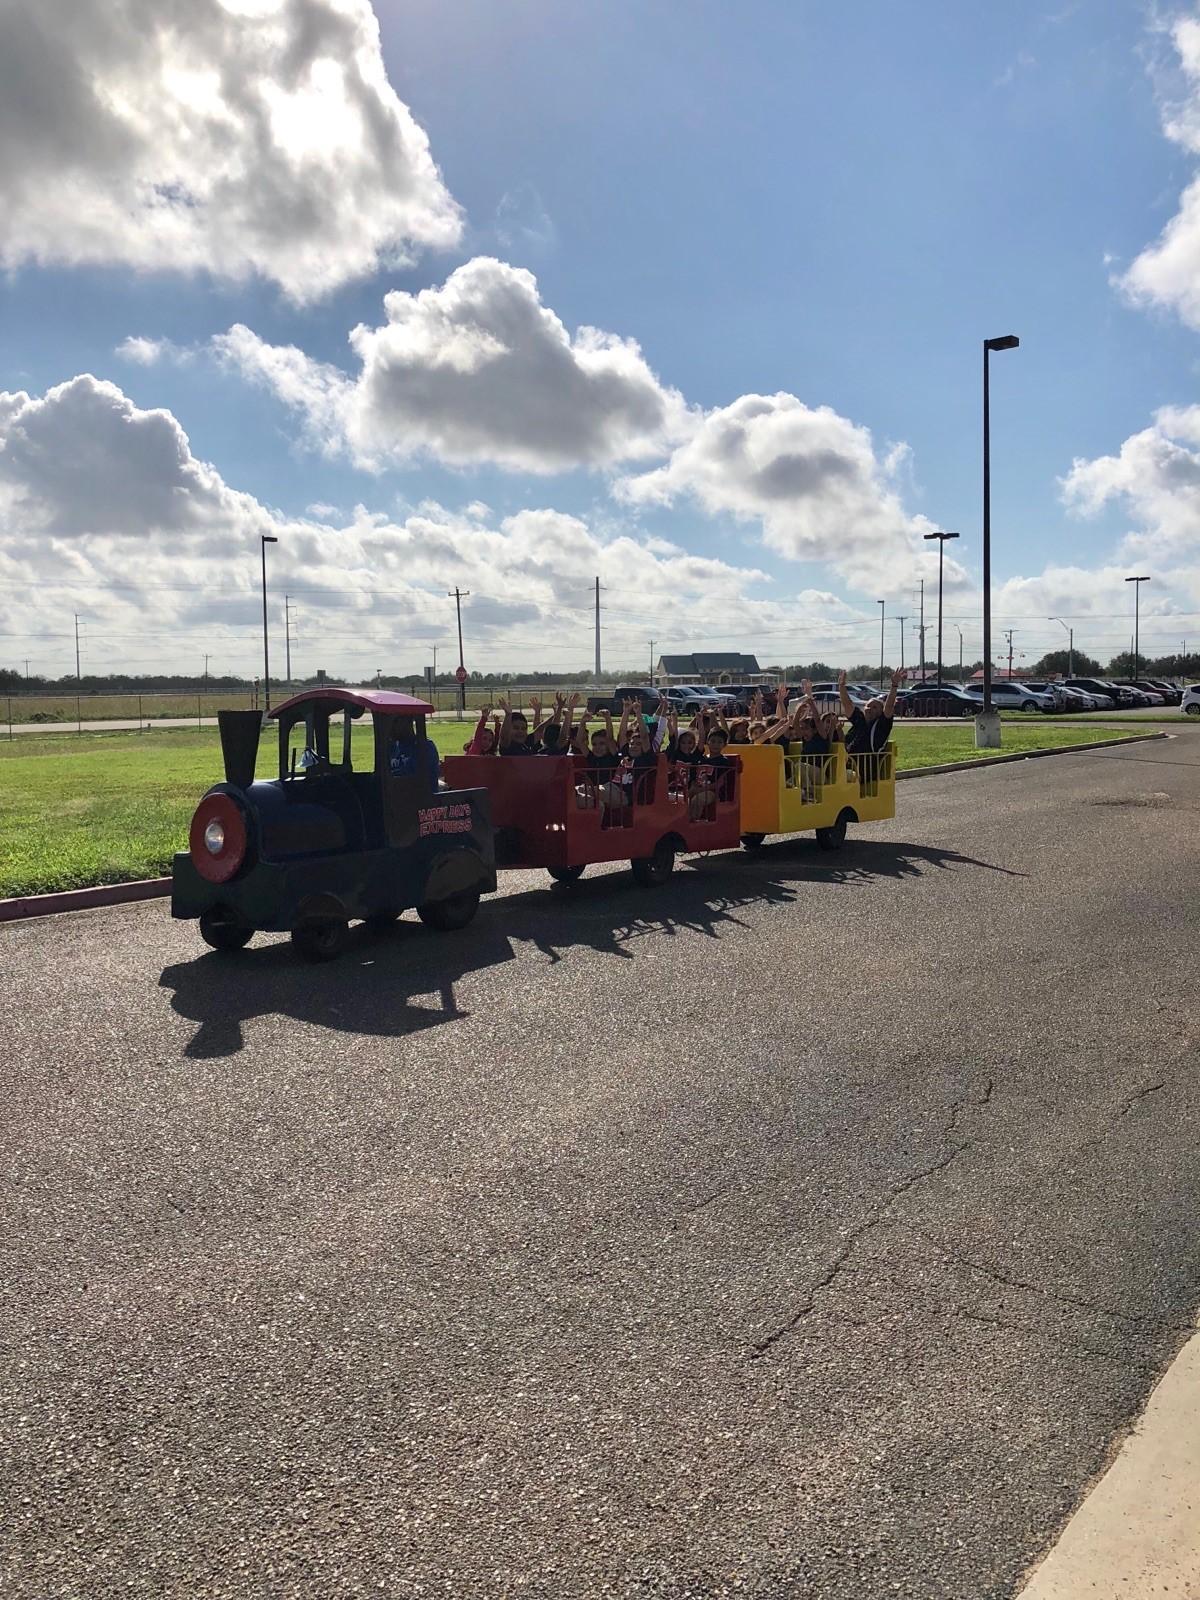 Image of AR celebration 2017-2018 train ride